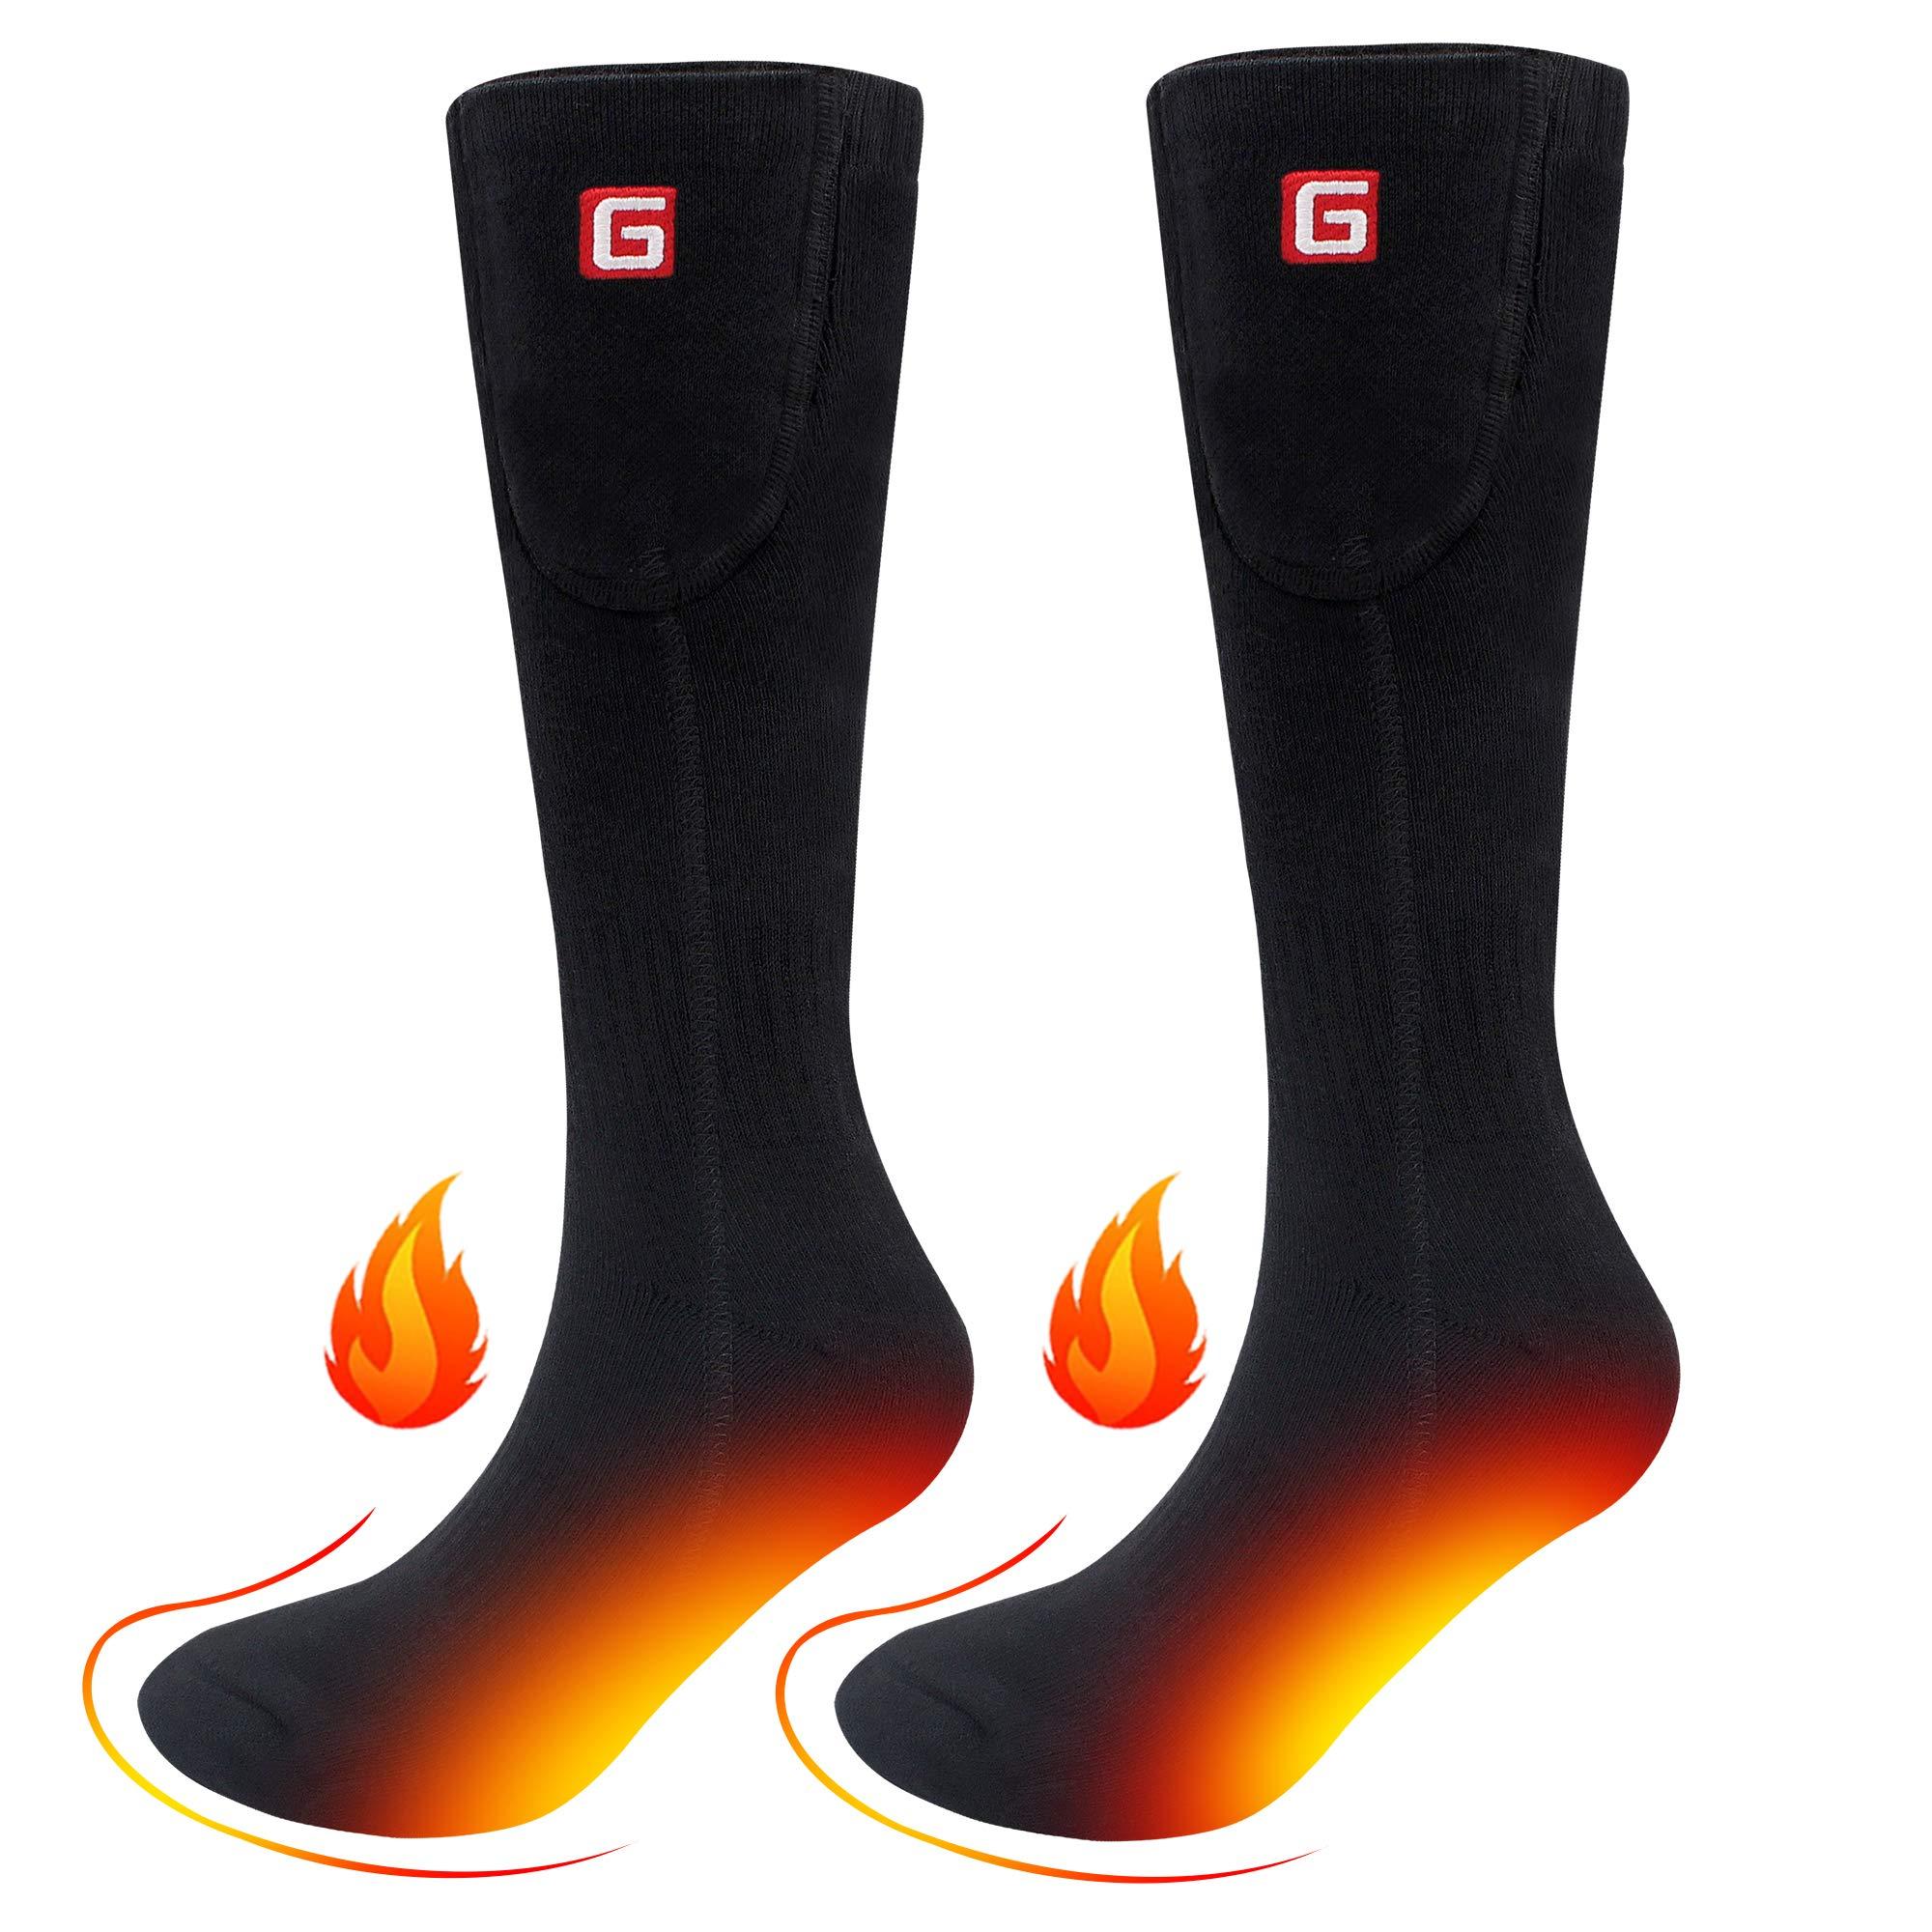 Daintymuse DM 3.7 Socks (Black) by Daintymuse